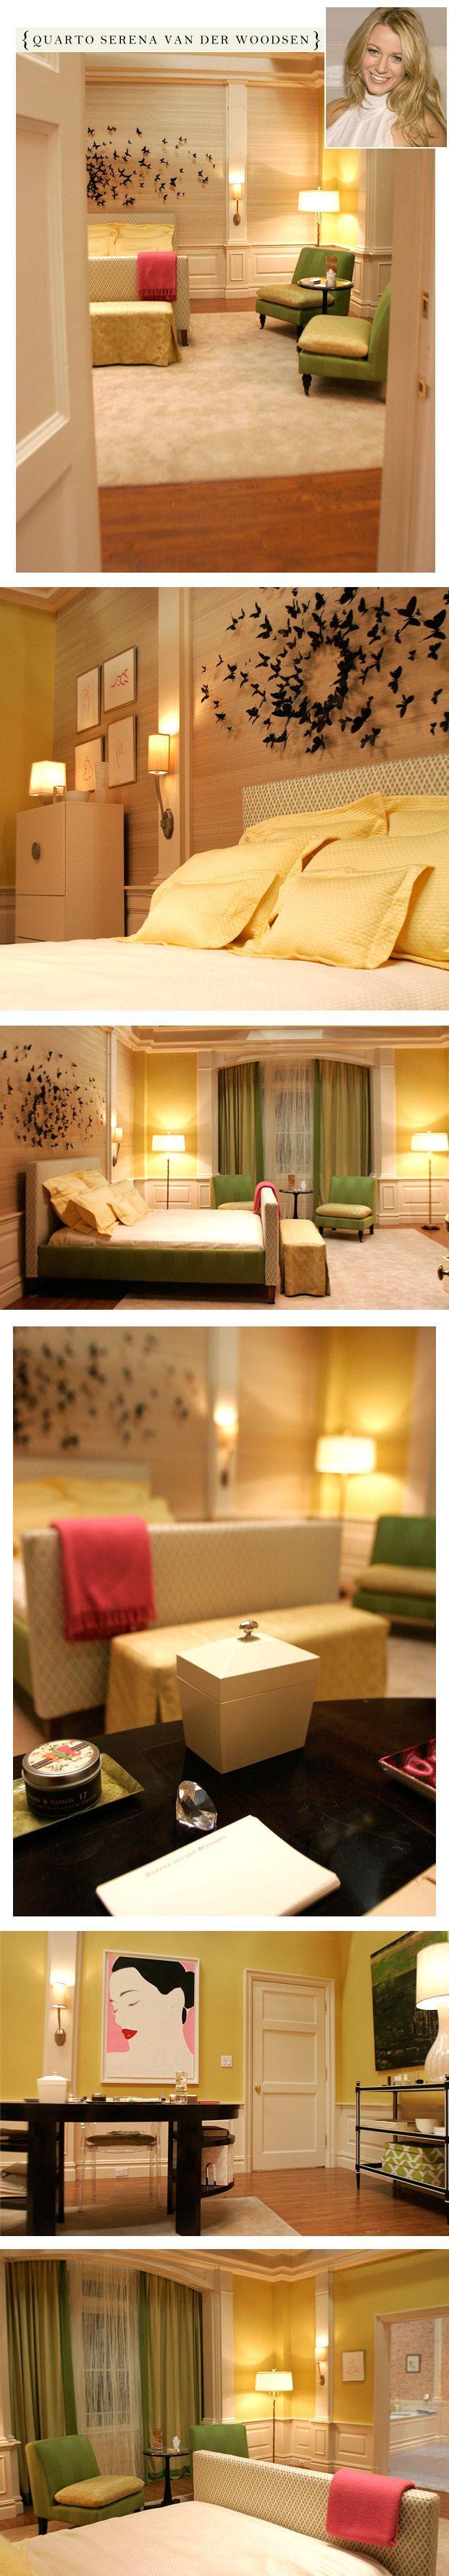 Serena Van der Woodsen's room. Love it. Wish I had this room. UES. Blair Waldrof's house.